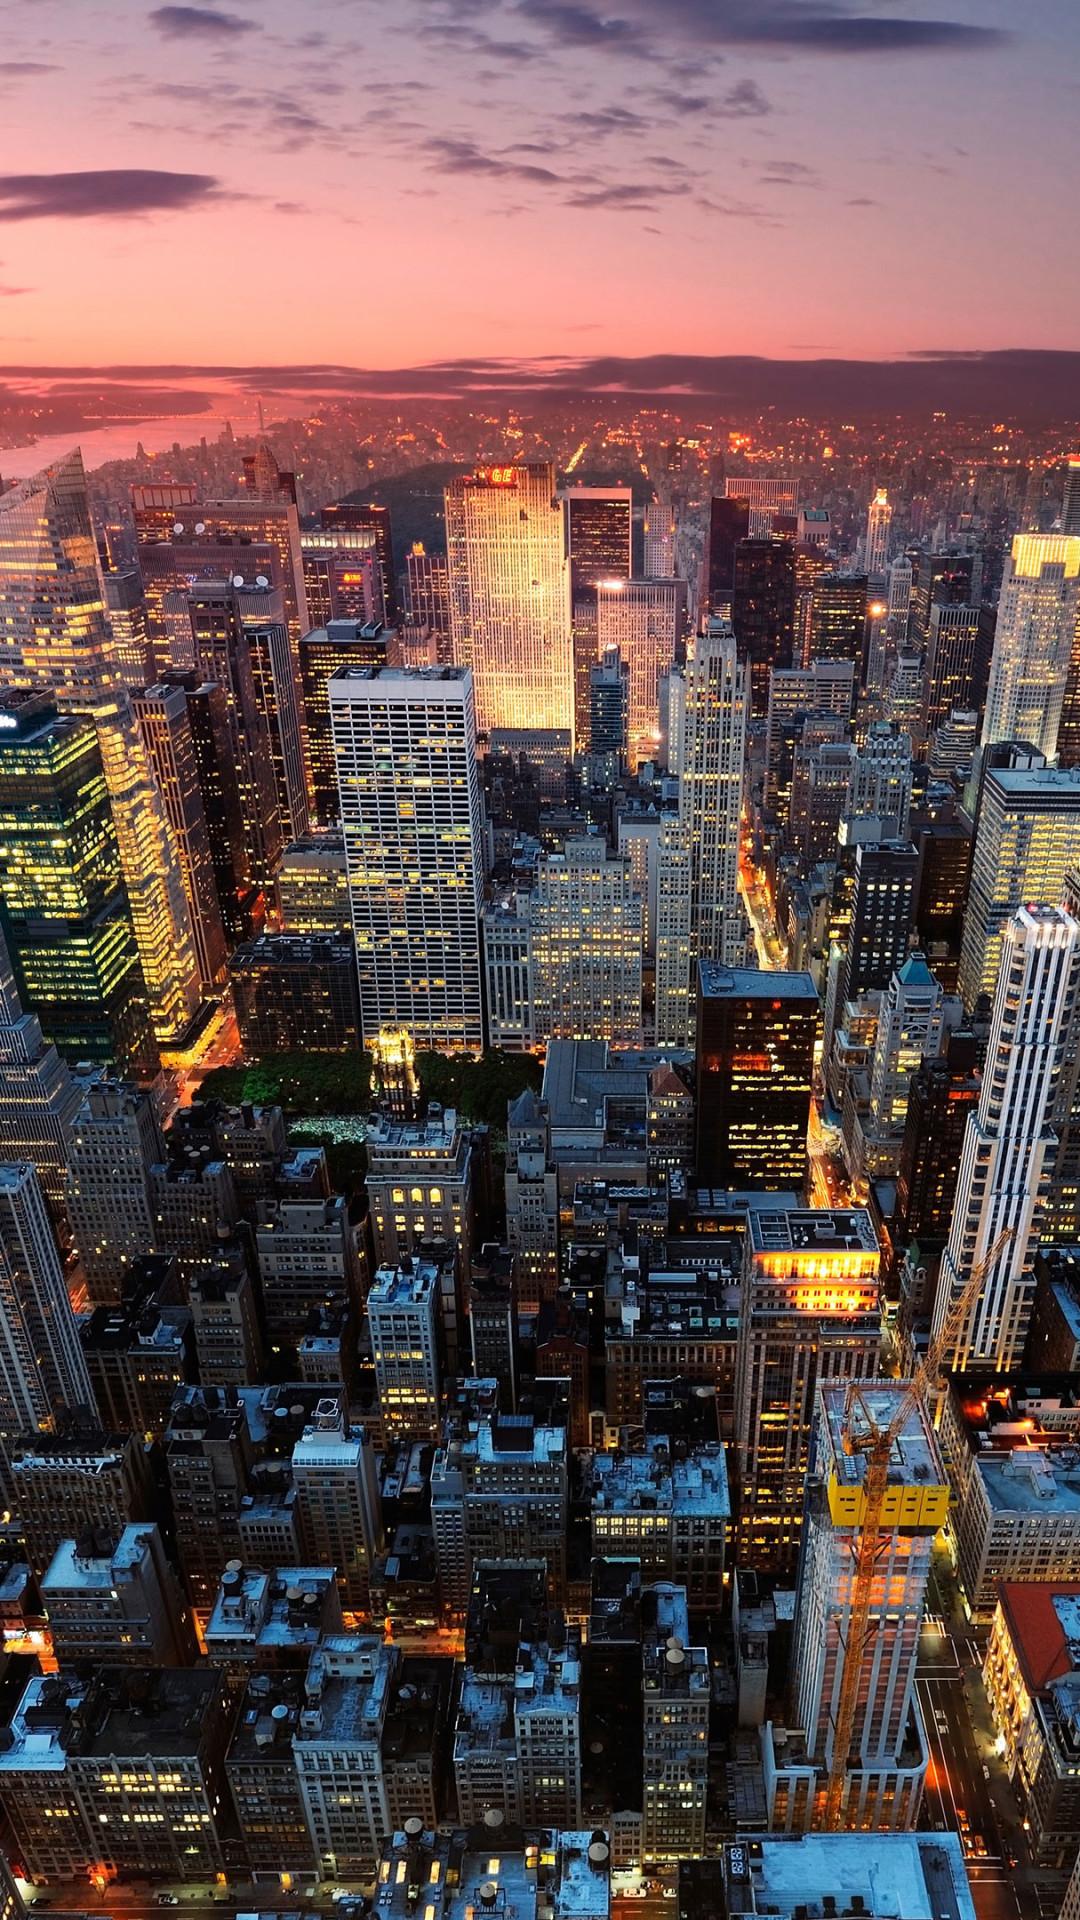 Cross Wallpaper Iphone 6 New York Sfondi 3d 58 Immagini